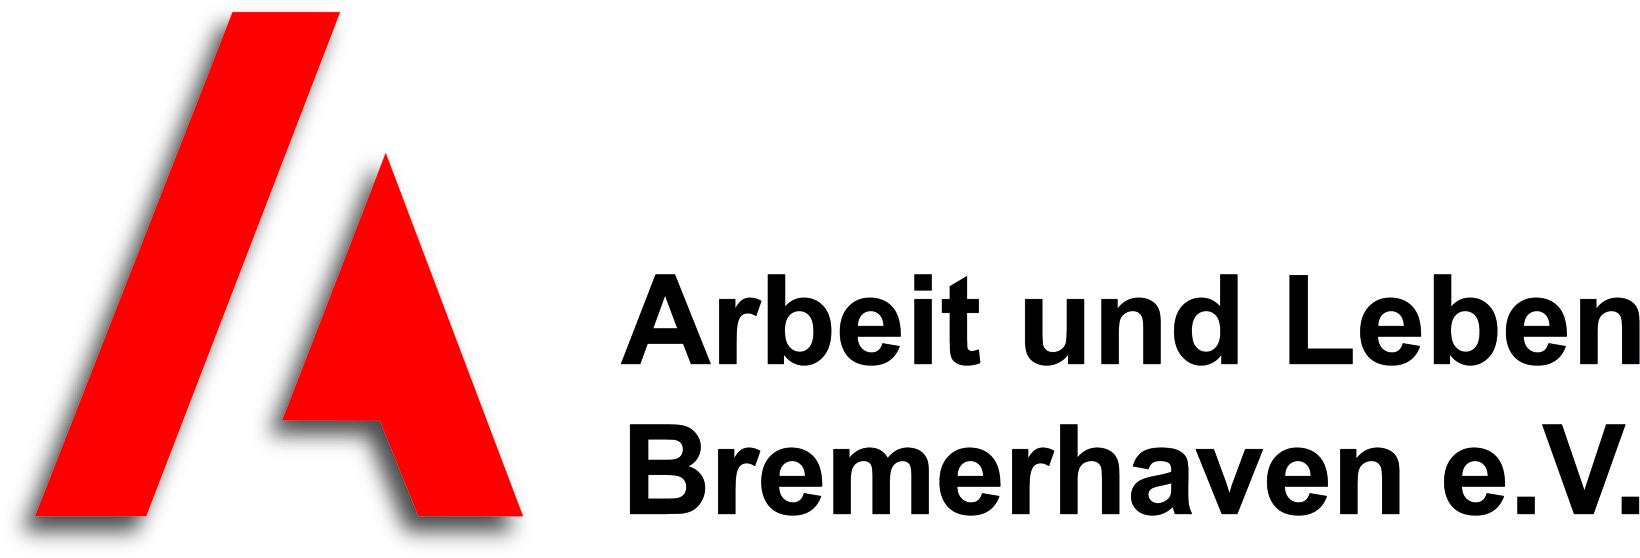 Logo (Arbeit und Leben Bremerhaven e.V.)